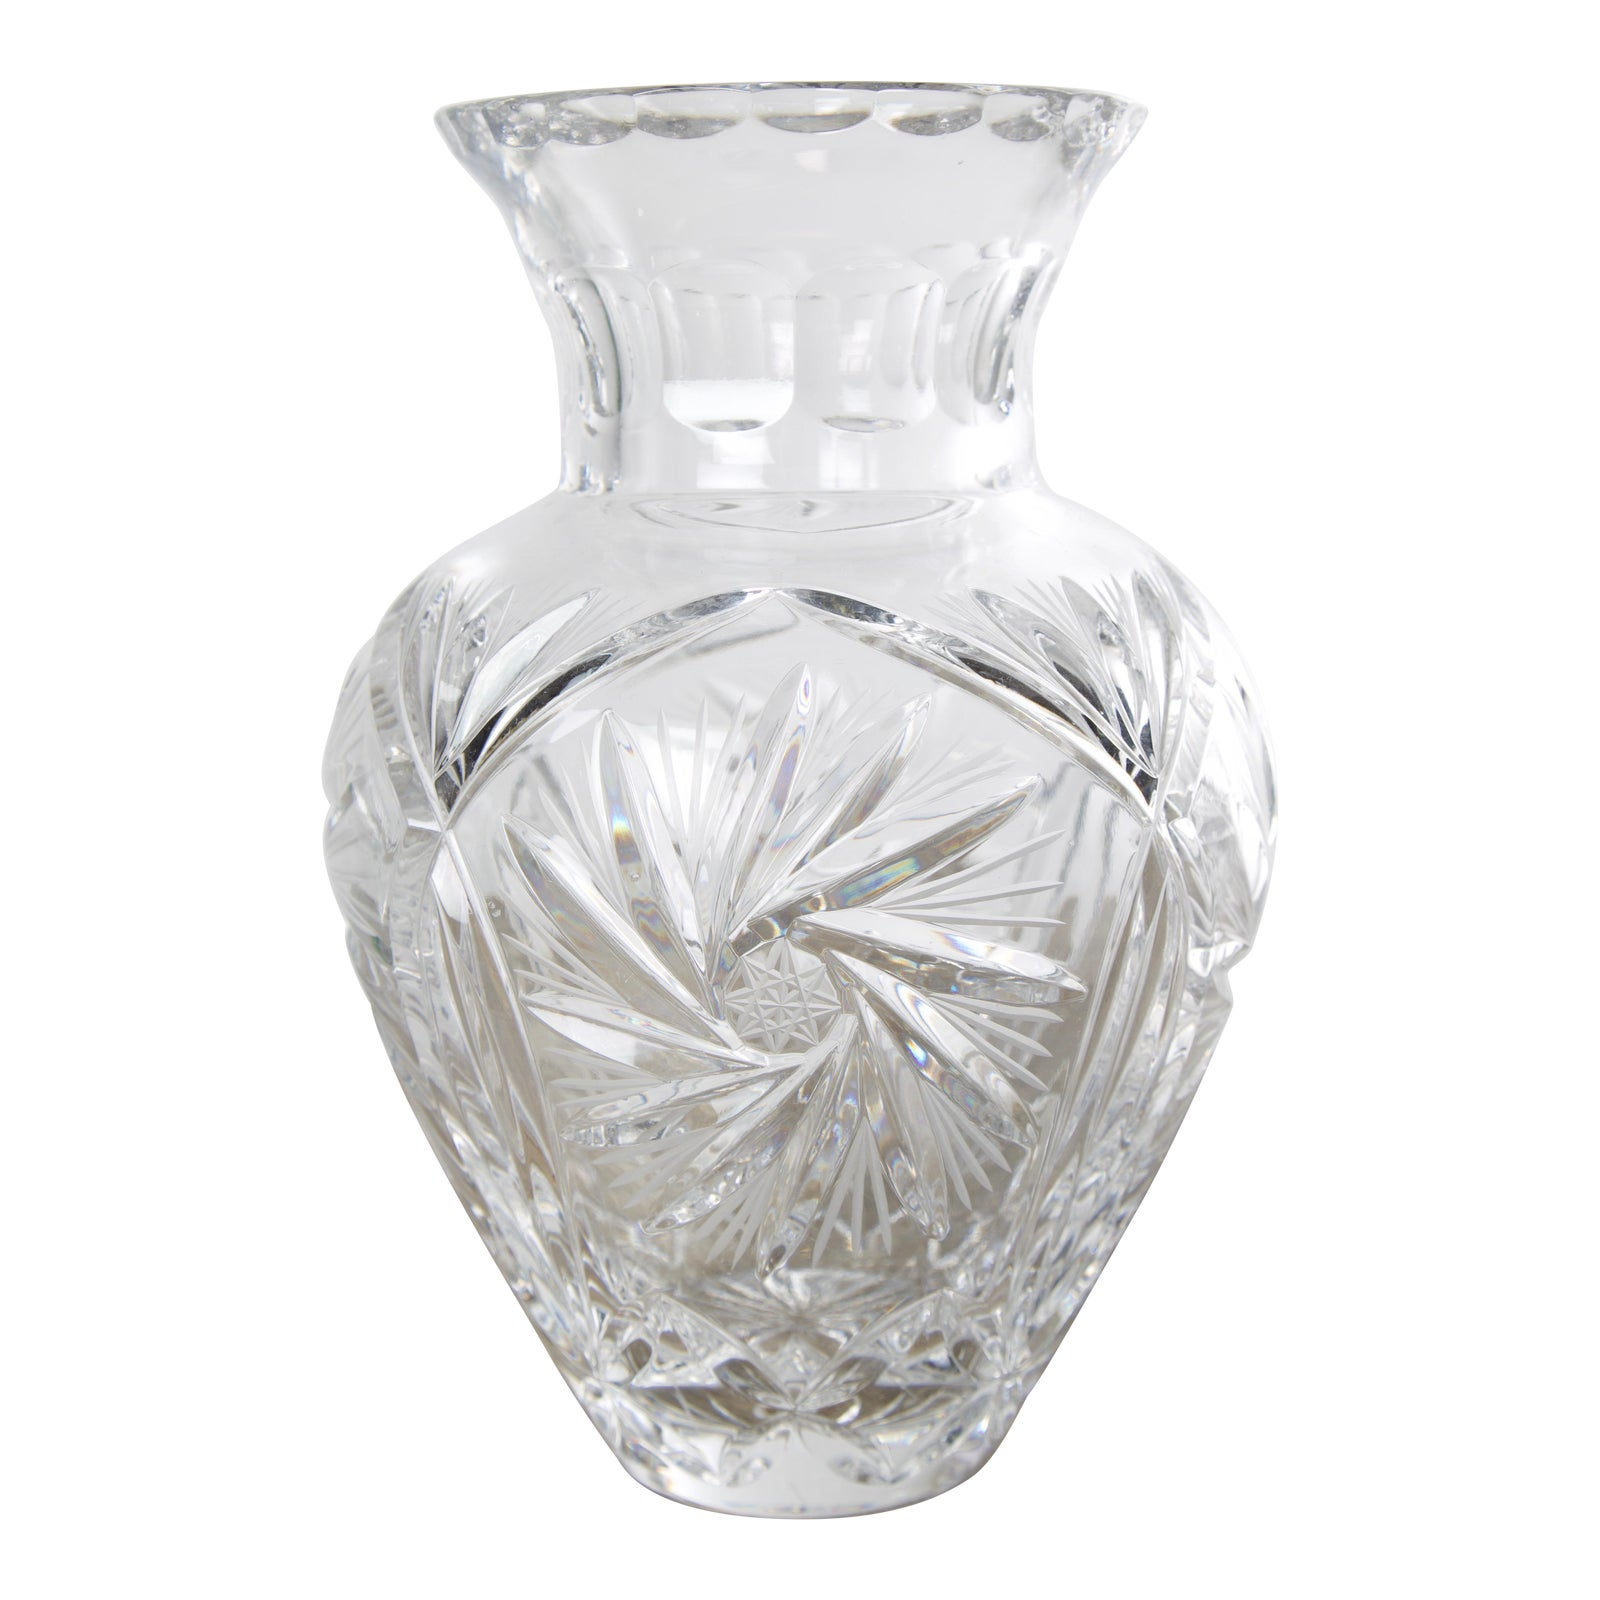 1960s Vintage Crystal Vase With Pinwheel Starburst Design ...